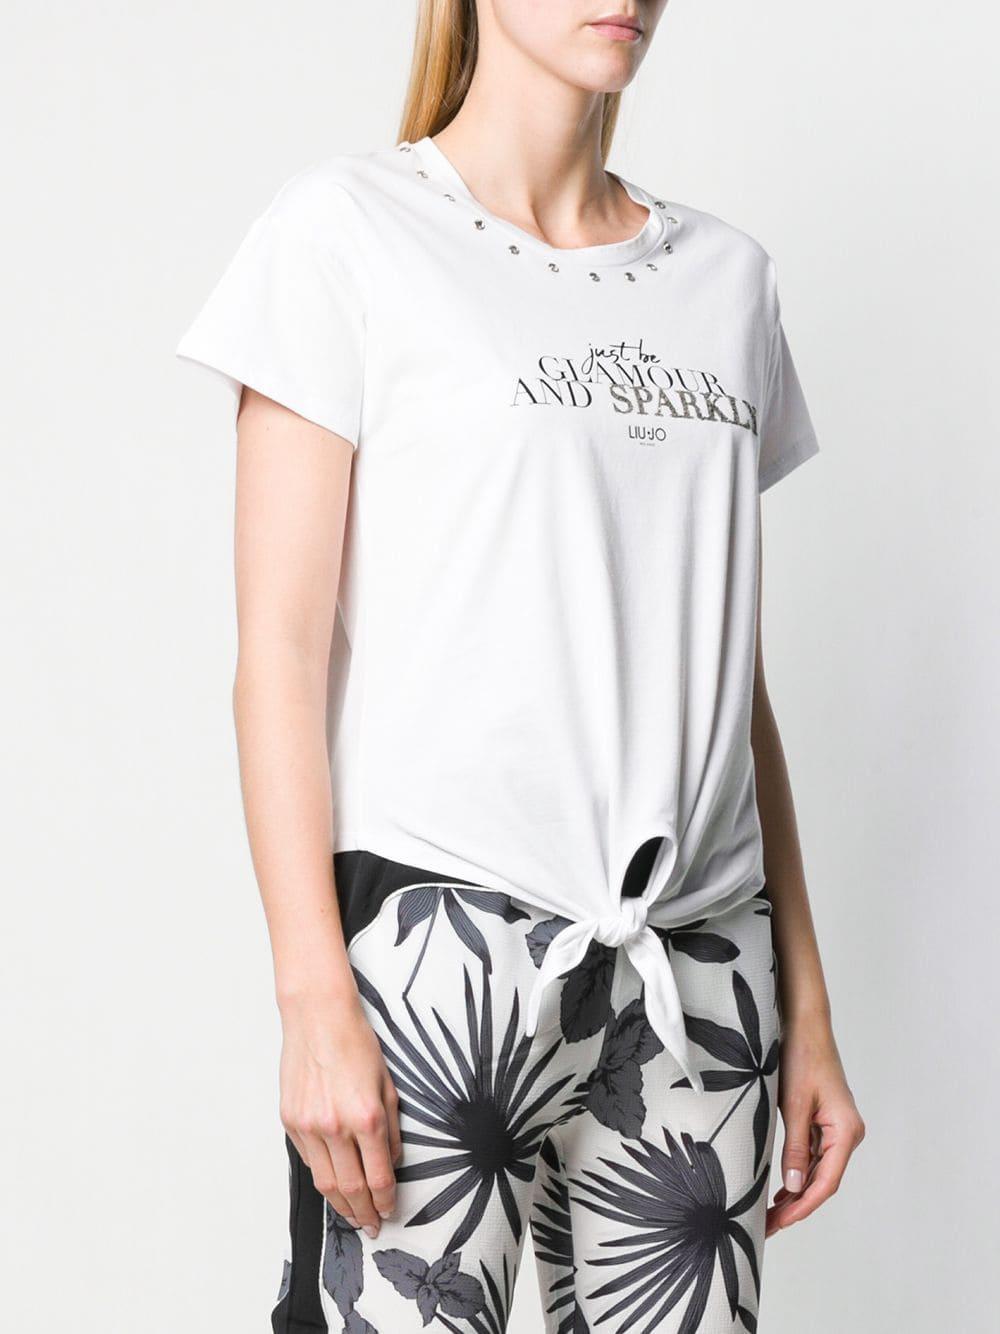 4dcf2904237 Liu Jo Safari Garden Party T-shirt in White - Lyst